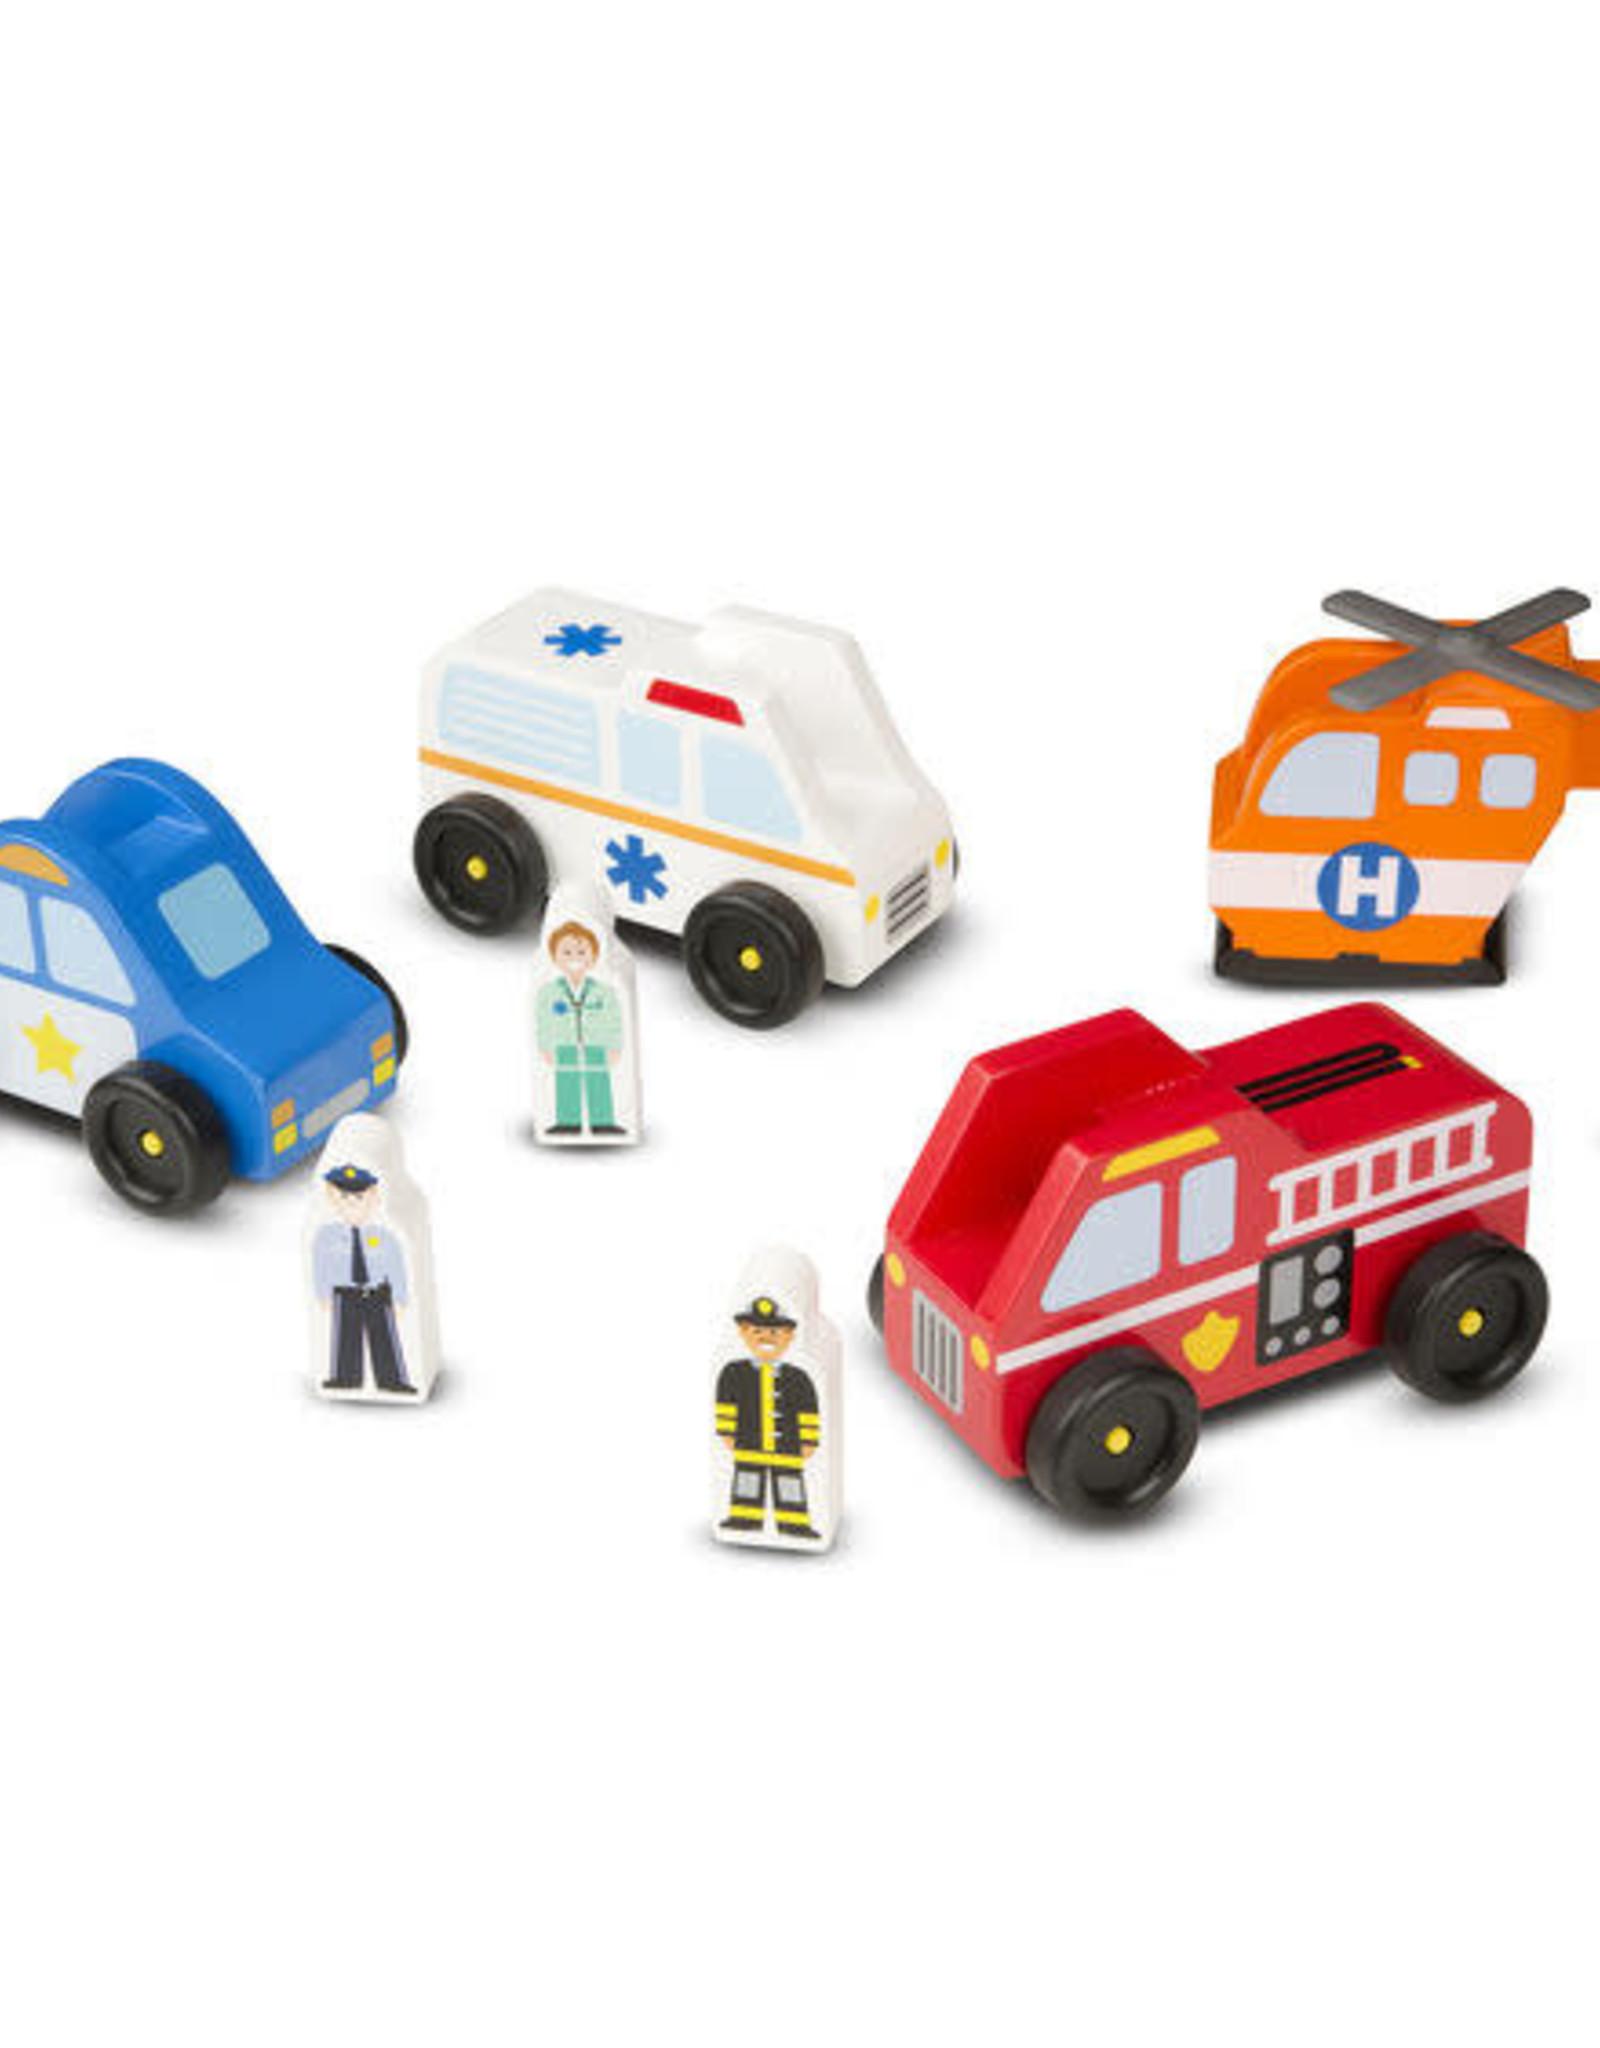 Melissa & Doug Melissa & Doug Emergency Vehicles Set